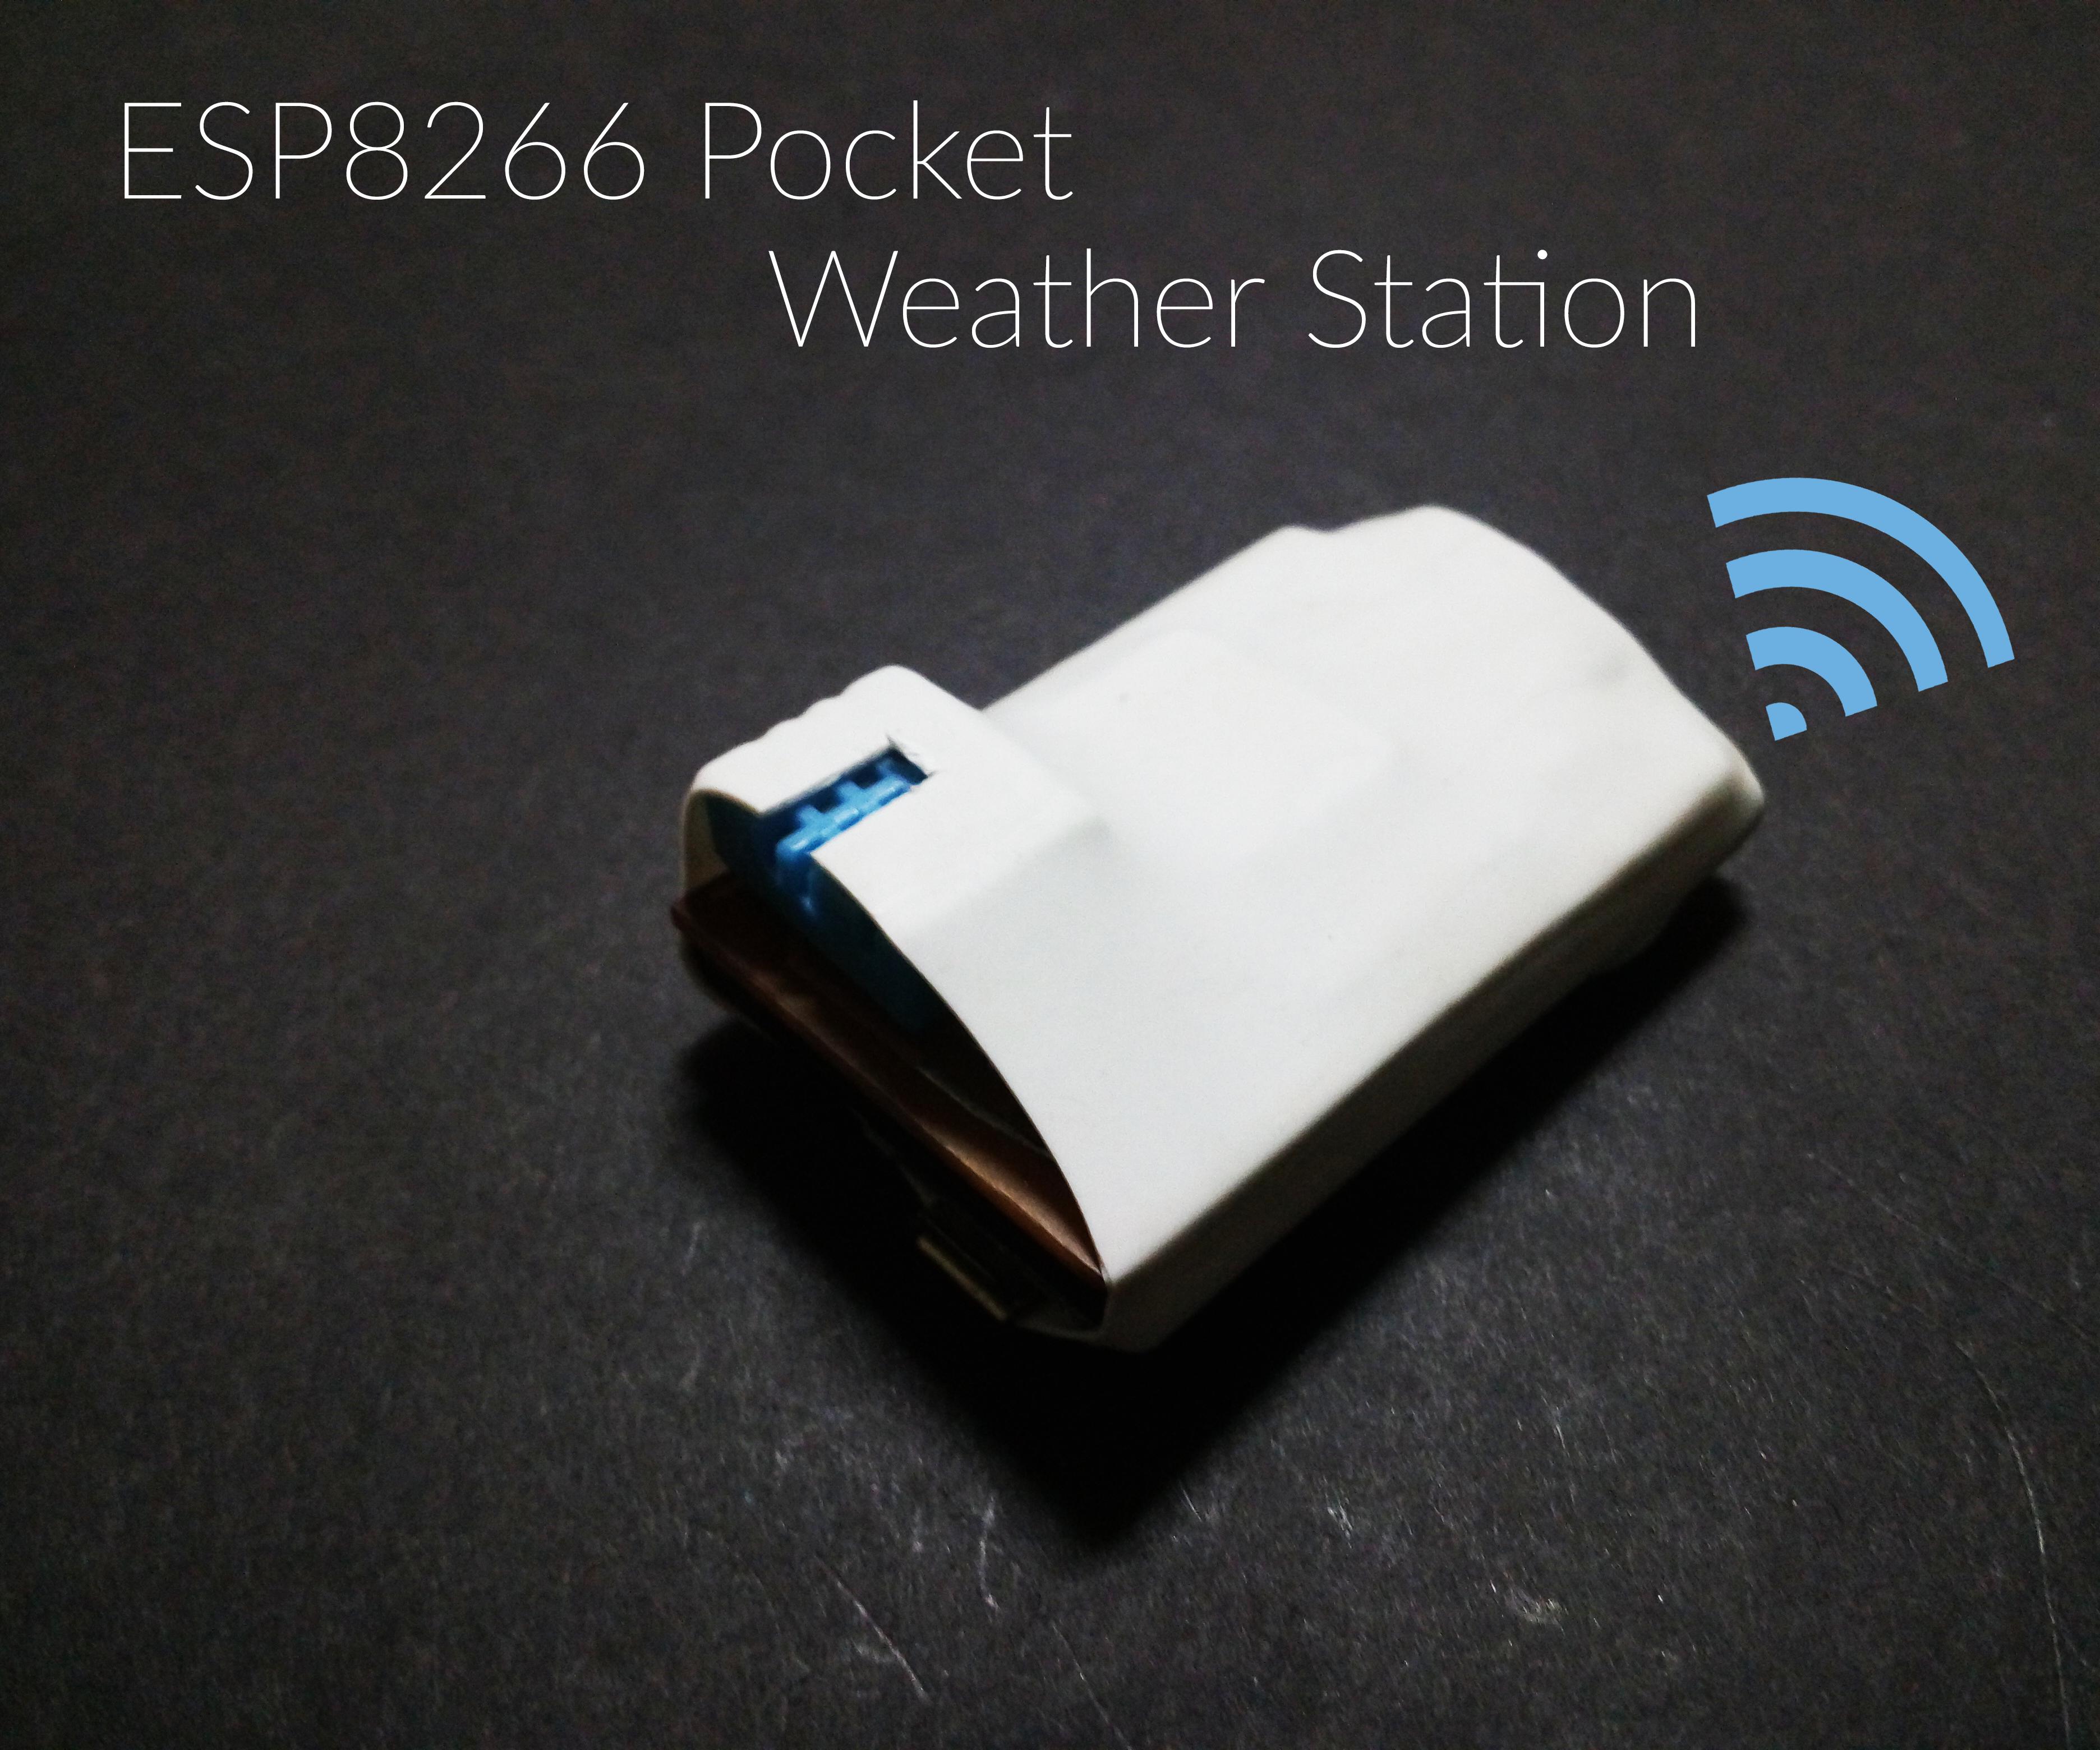 Pocket ESP8266 Weather Station [ No ThingsSpeak] [Battery Powered]